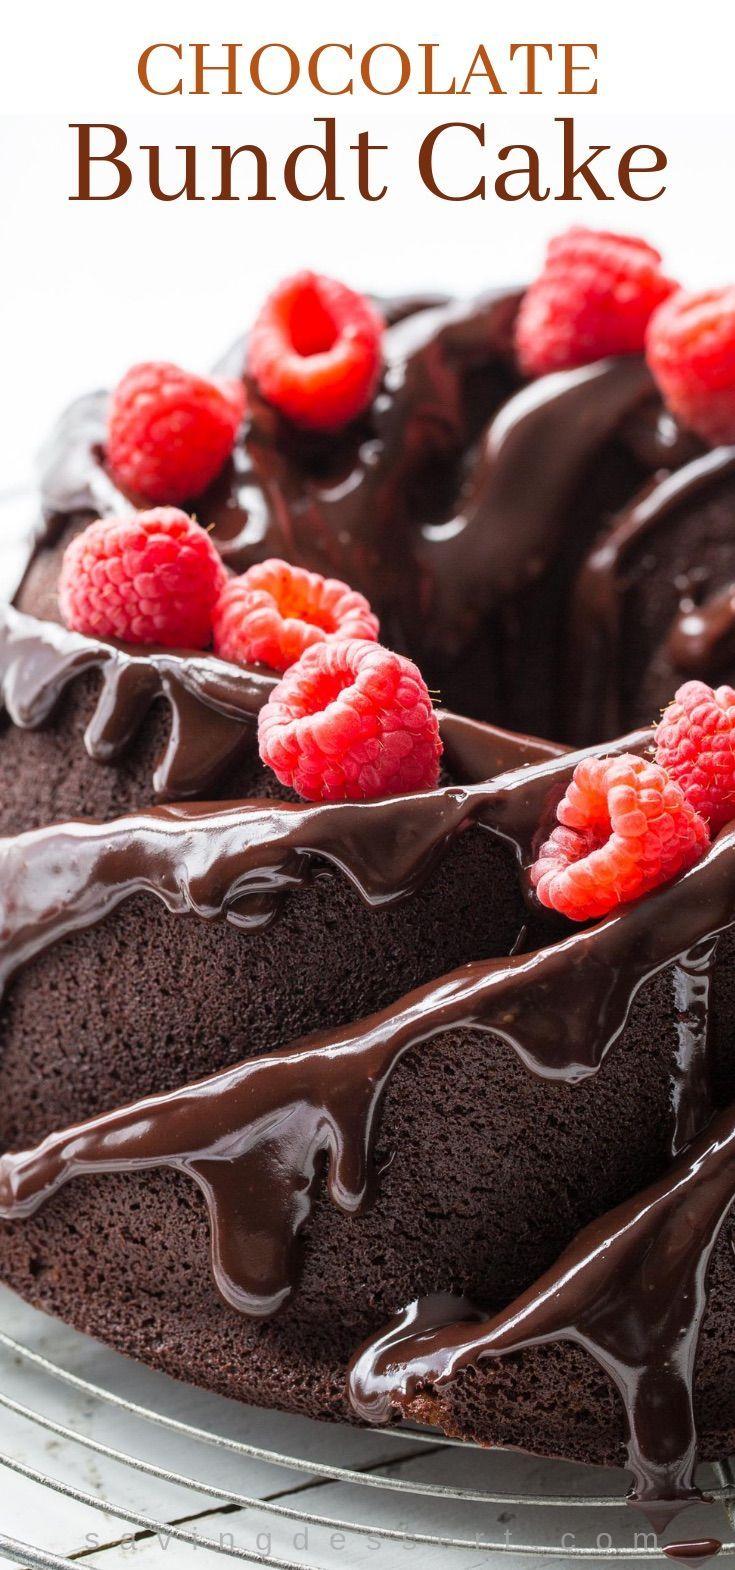 Chocolate Bundt Cake #easychocolatecake